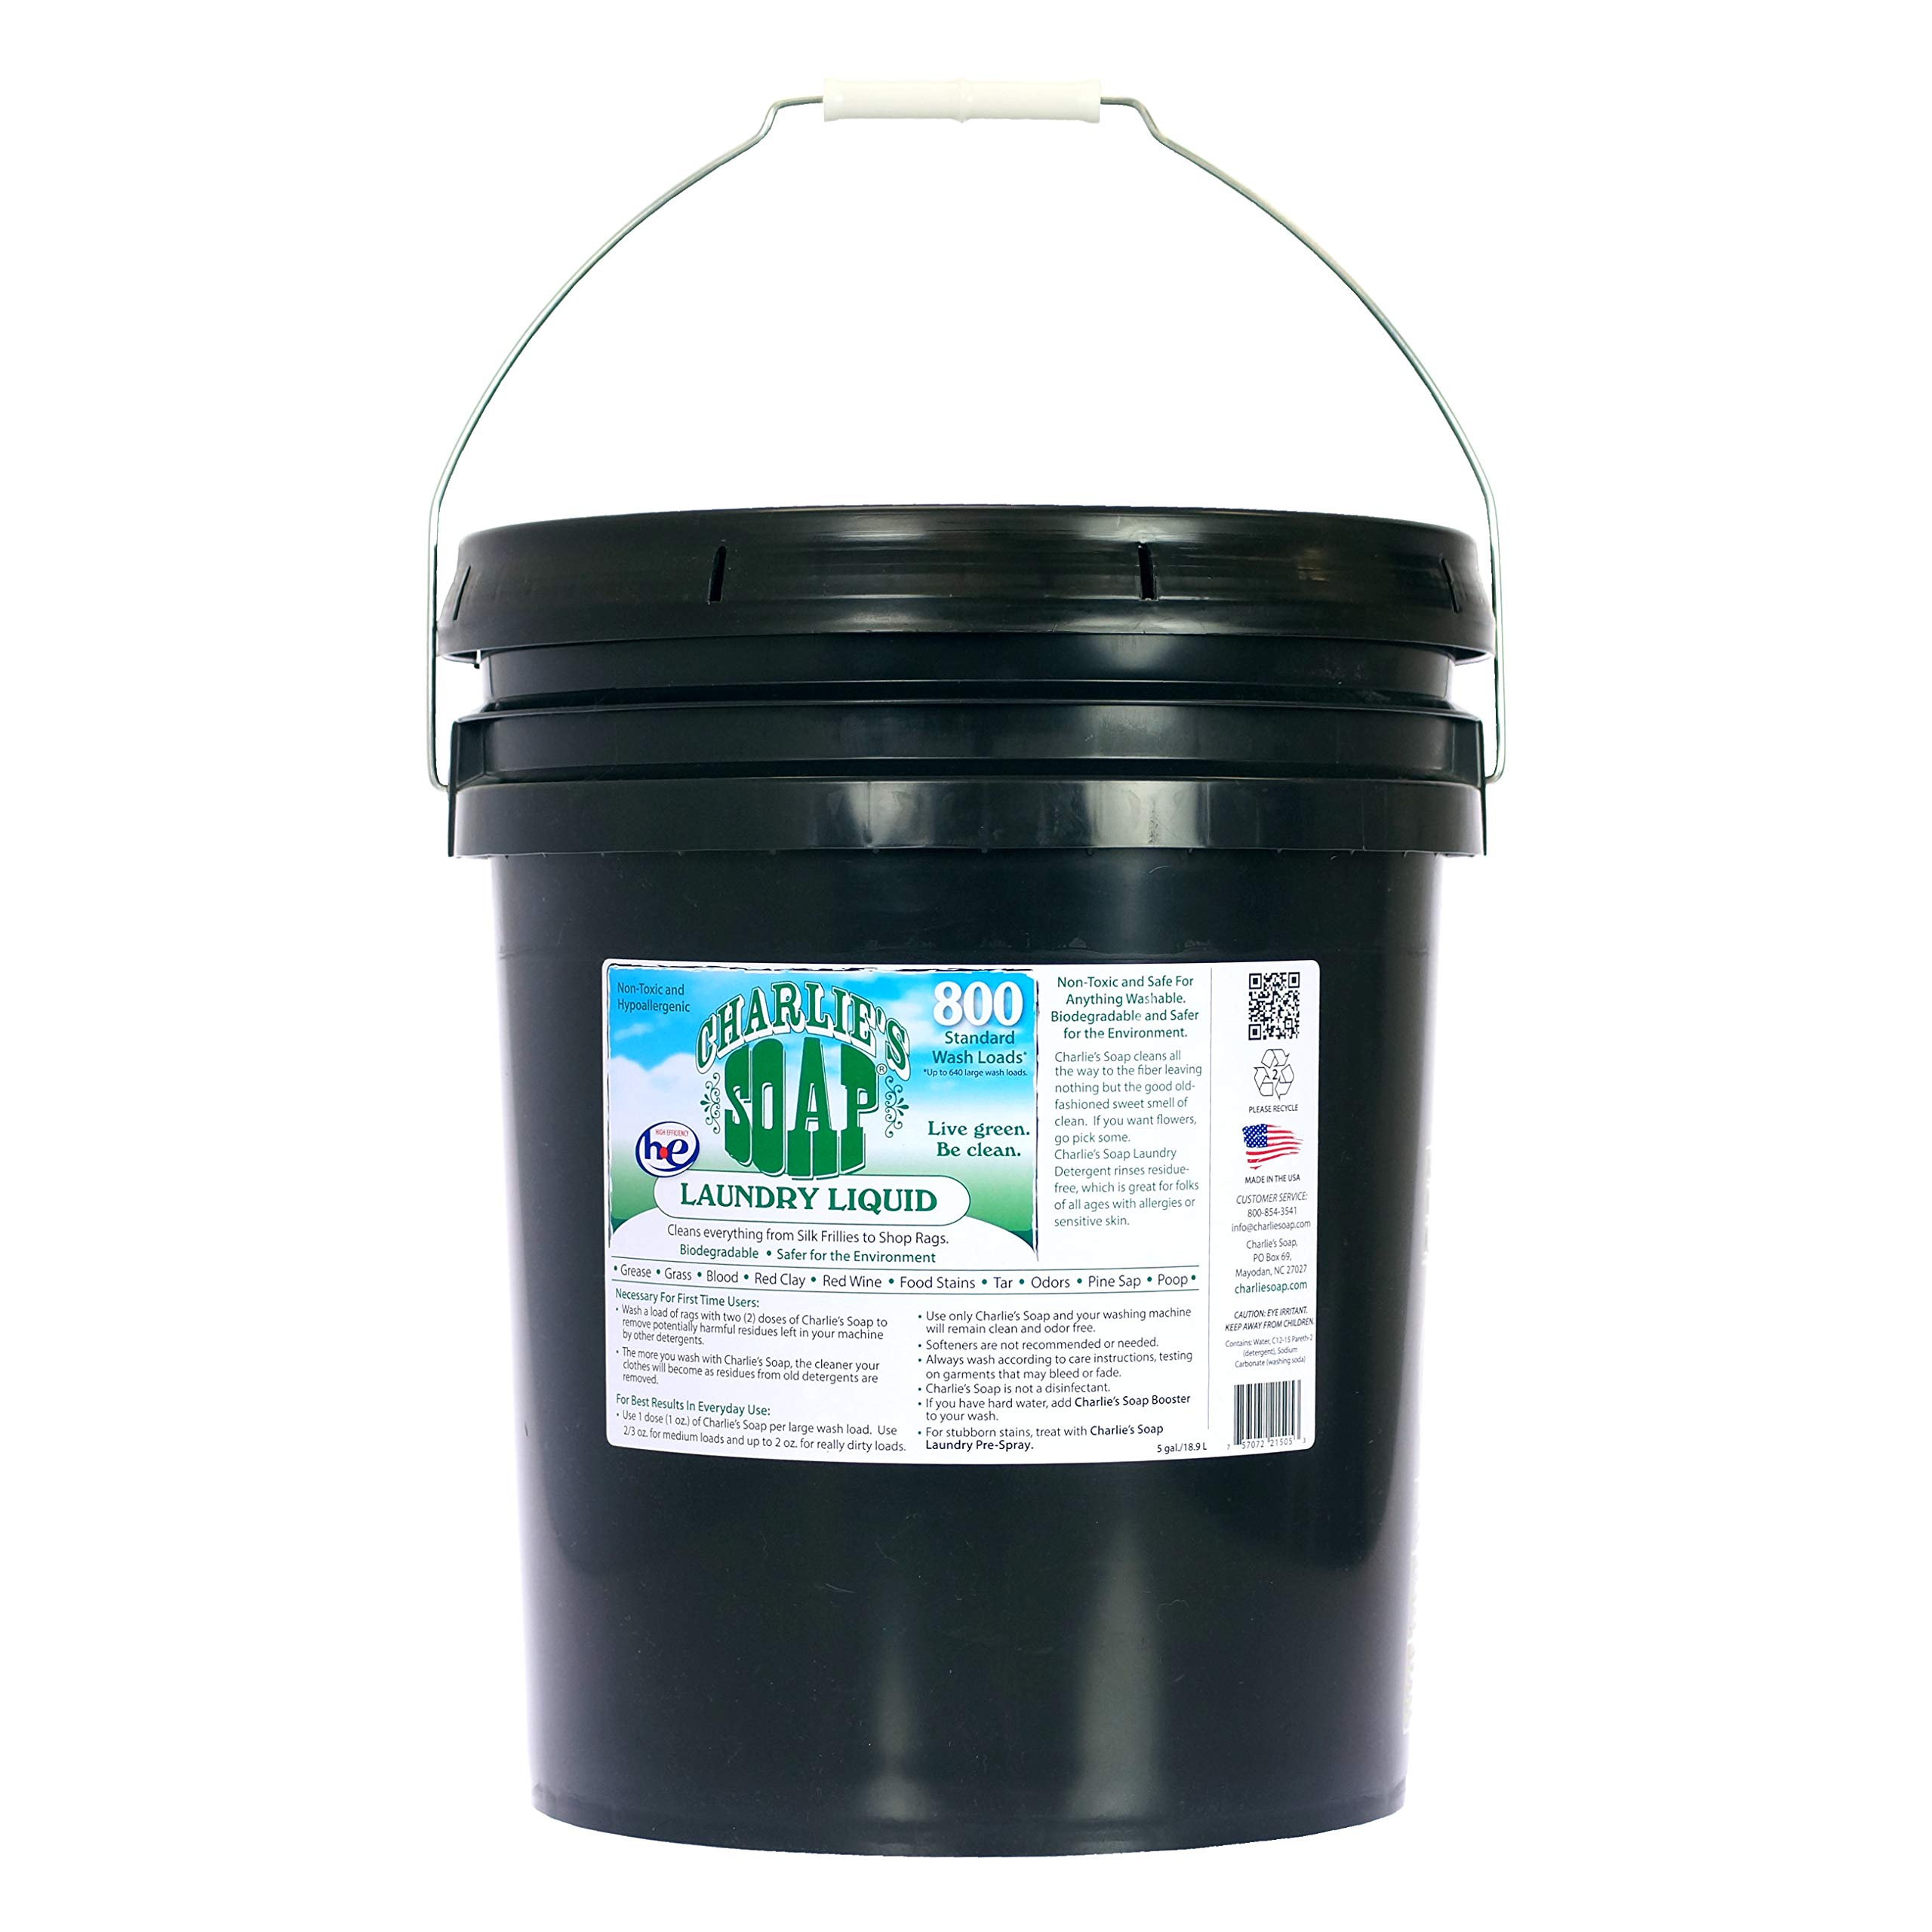 Charlie's Soap – Fragrance-Free Laundry Liquid detergent – 800 Loads (5 Gallon Bucket)